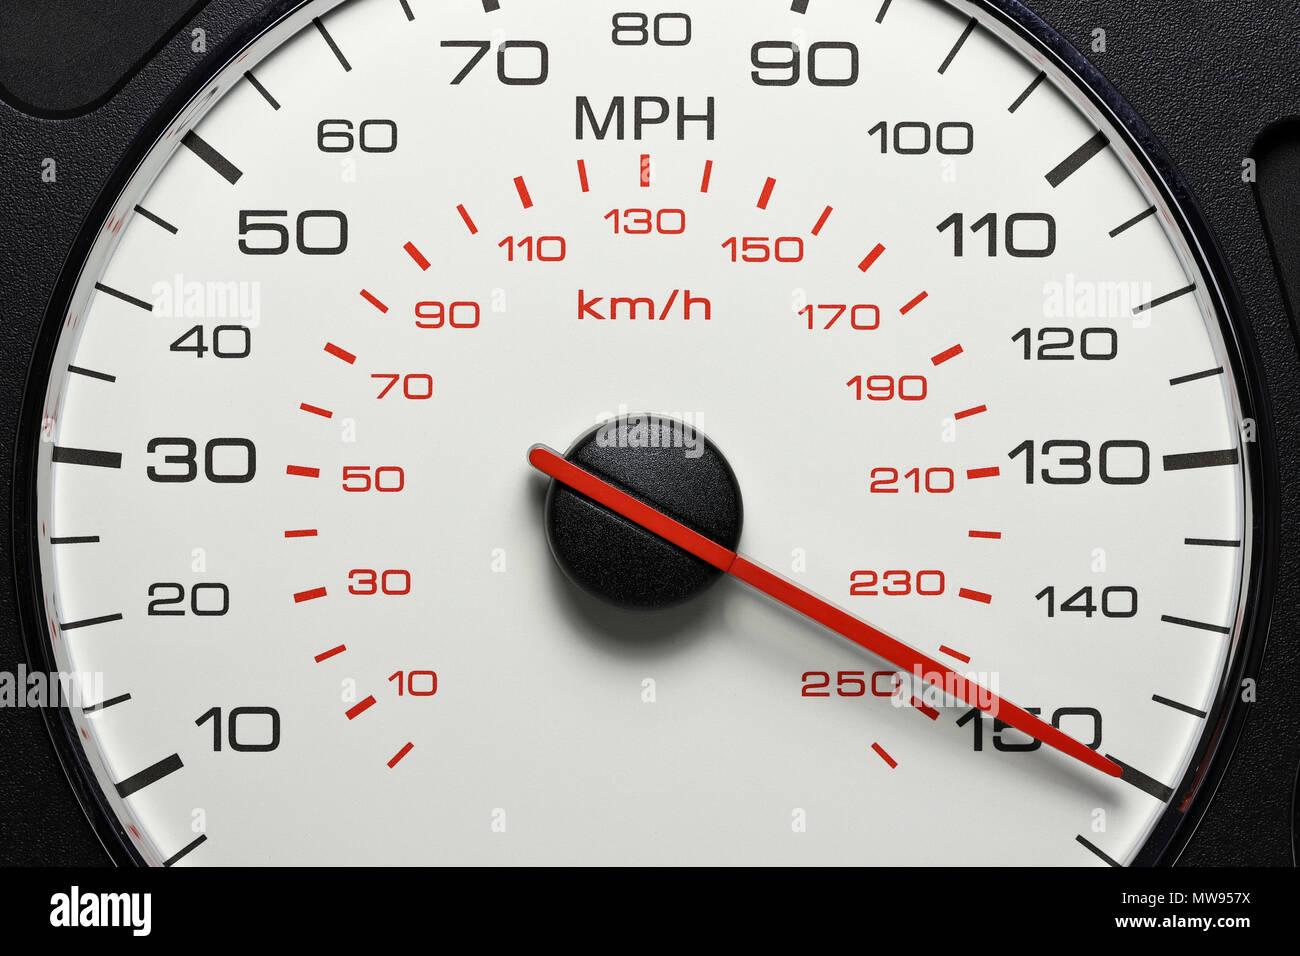 speedometer at 150 mph stock photo alamy https www alamy com speedometer at 150 mph image187671790 html